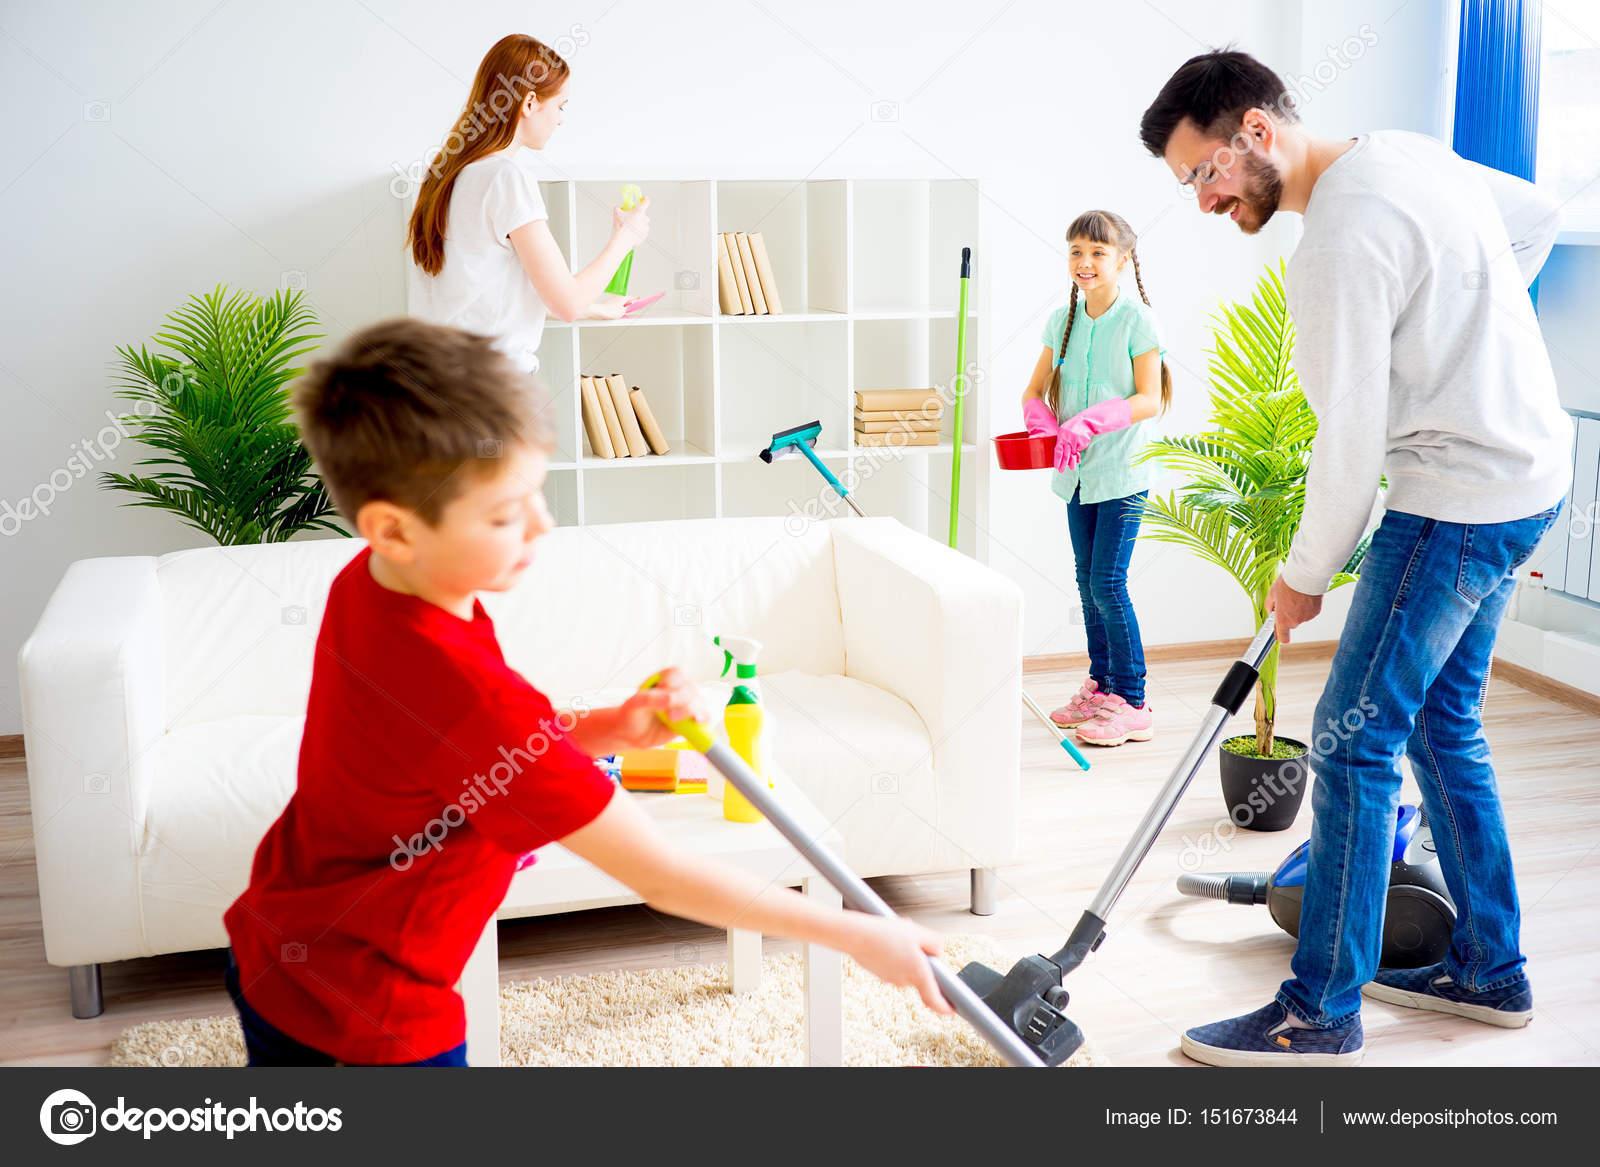 Family cleaning house stock photo lenanichizhenova for House cleaning stock photos